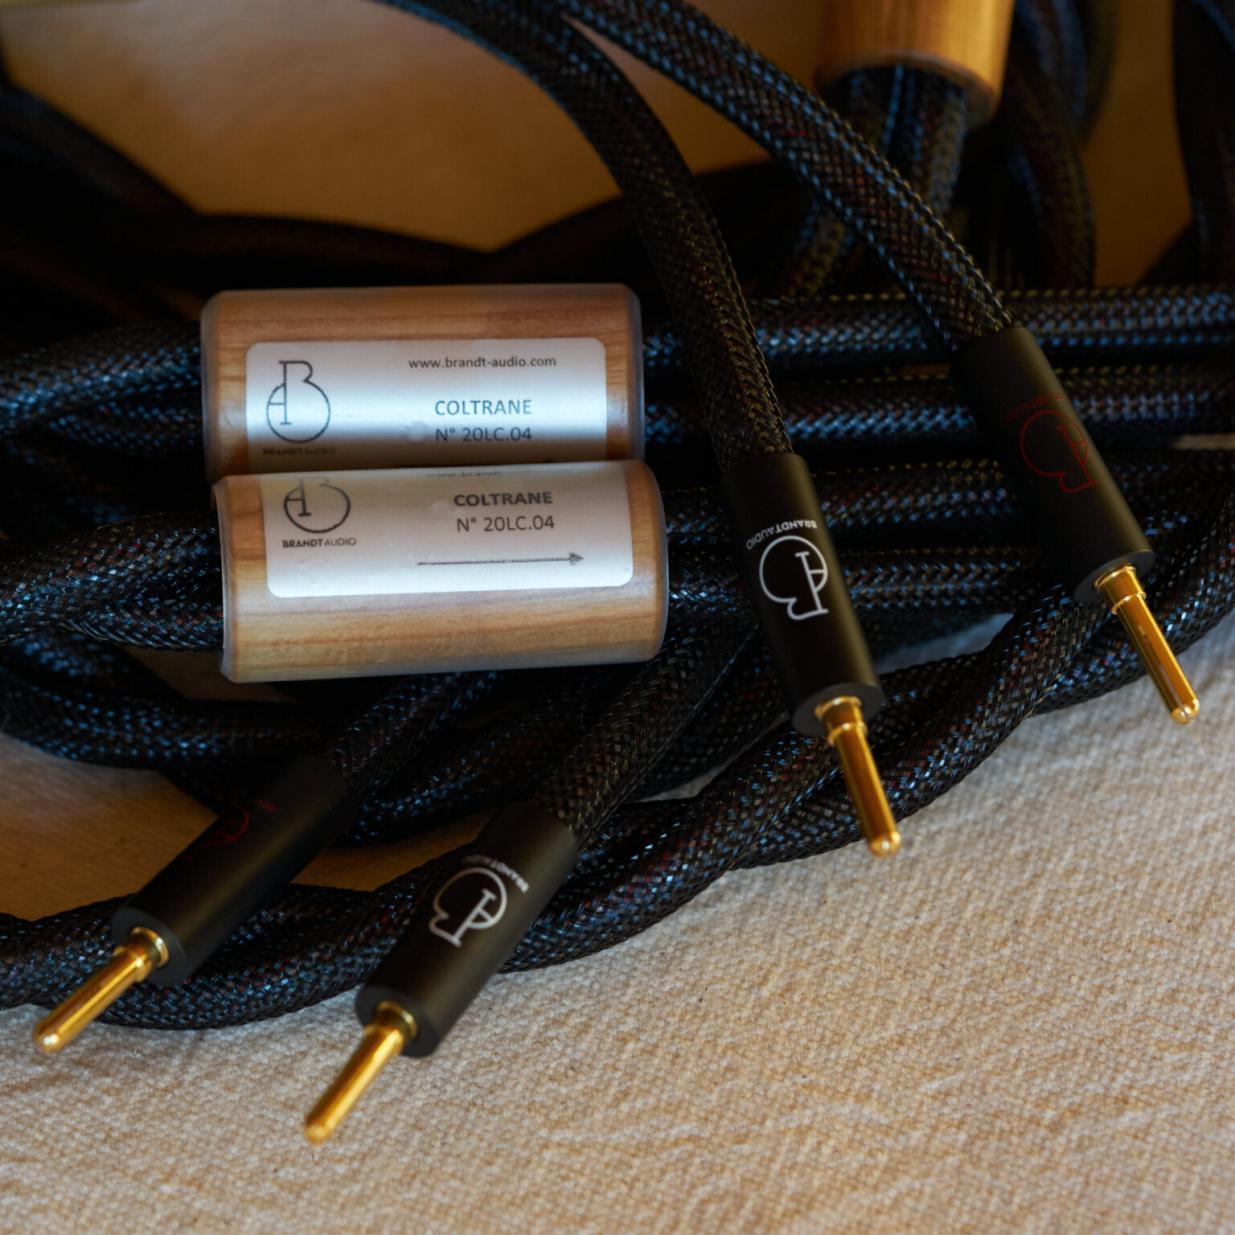 Акустический кабель Brandt Audio Coltrane 2.5m